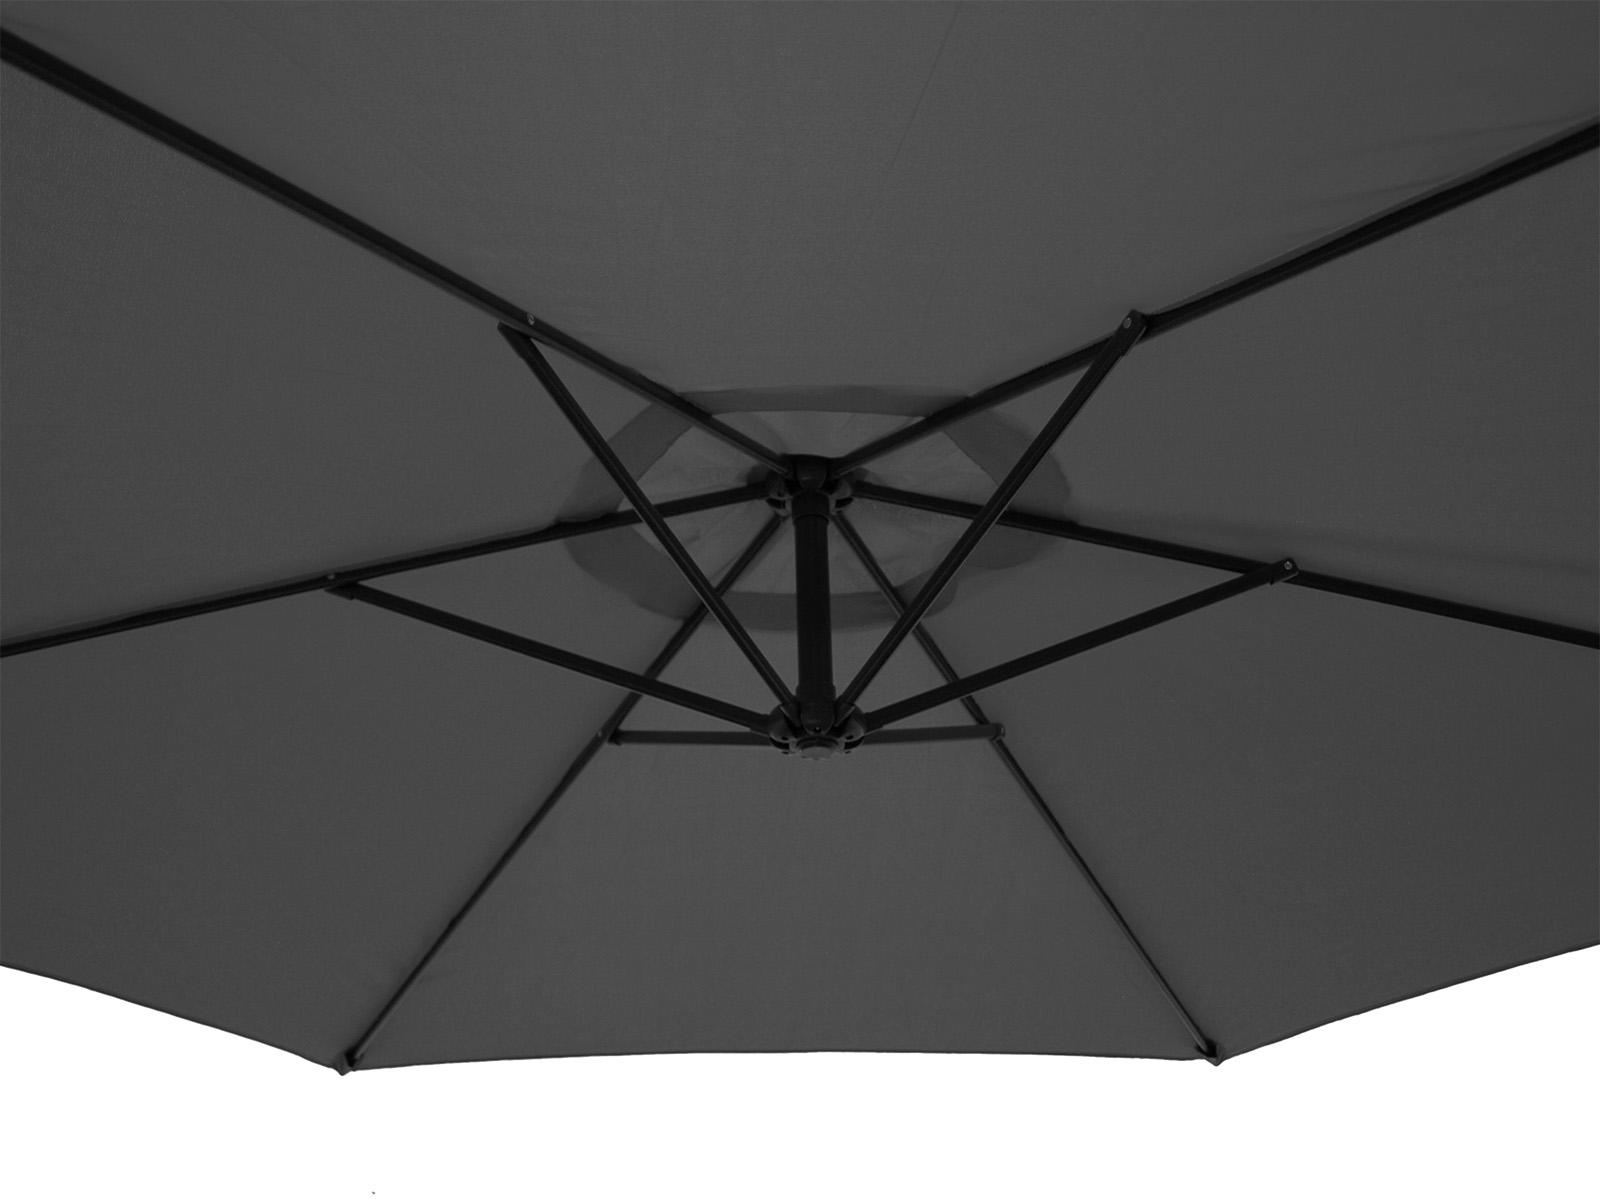 Ampelschirm 300cm rund, Gestell Aluminium, Bezug 100% Polyester grau, 10kg